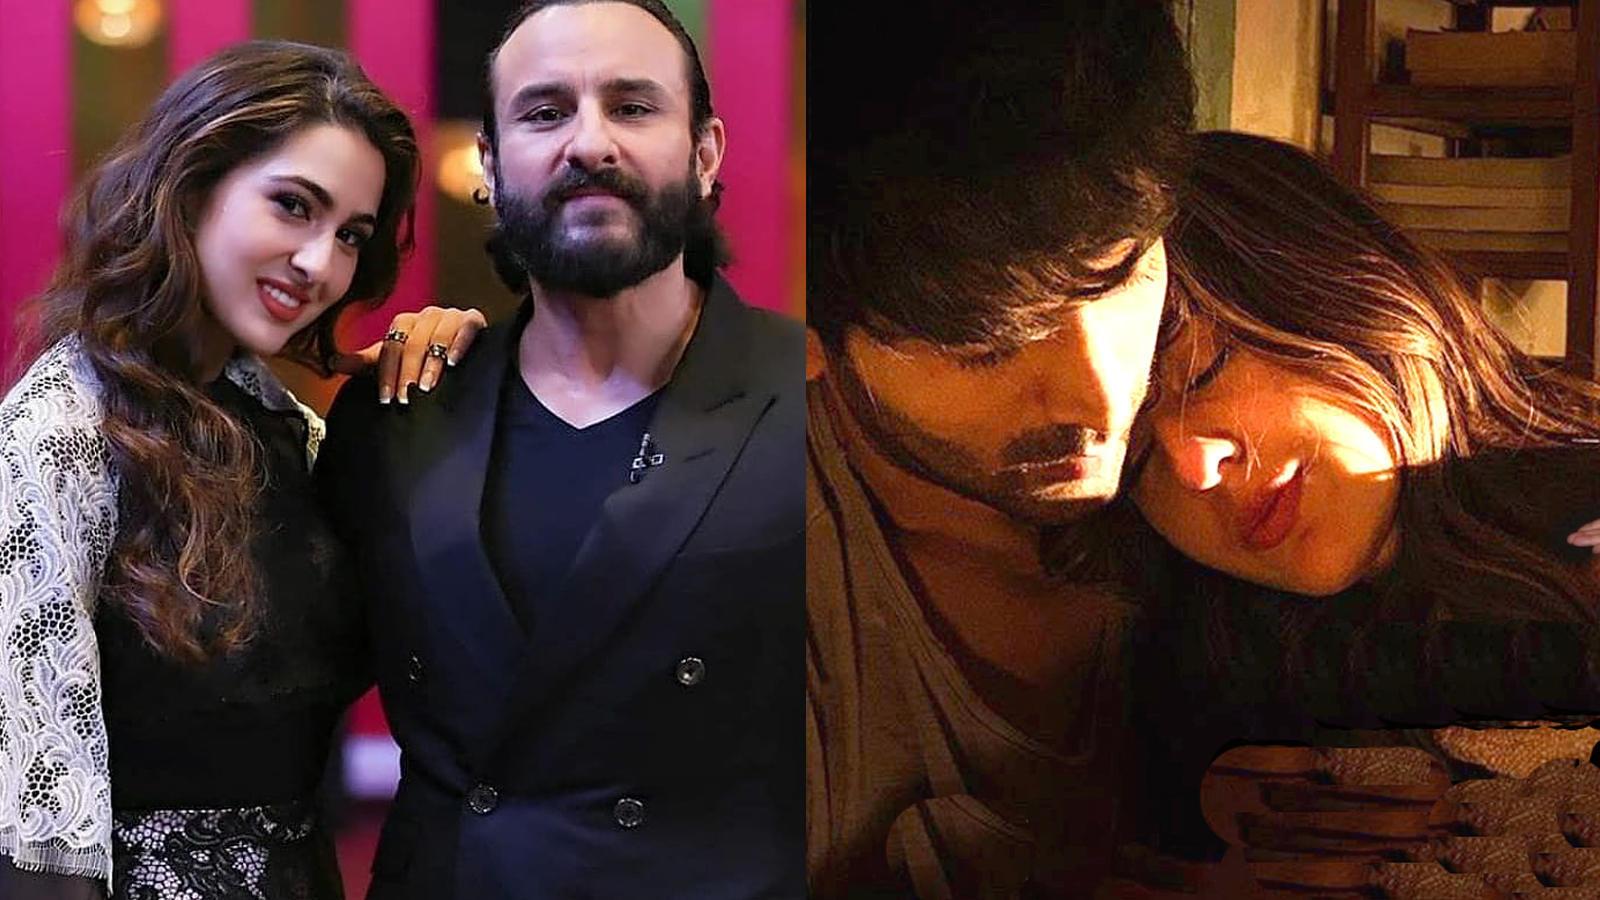 Sara Ali Khan on father Saif Ali Khan's reaction to 'Love Aaj Kal' trailer